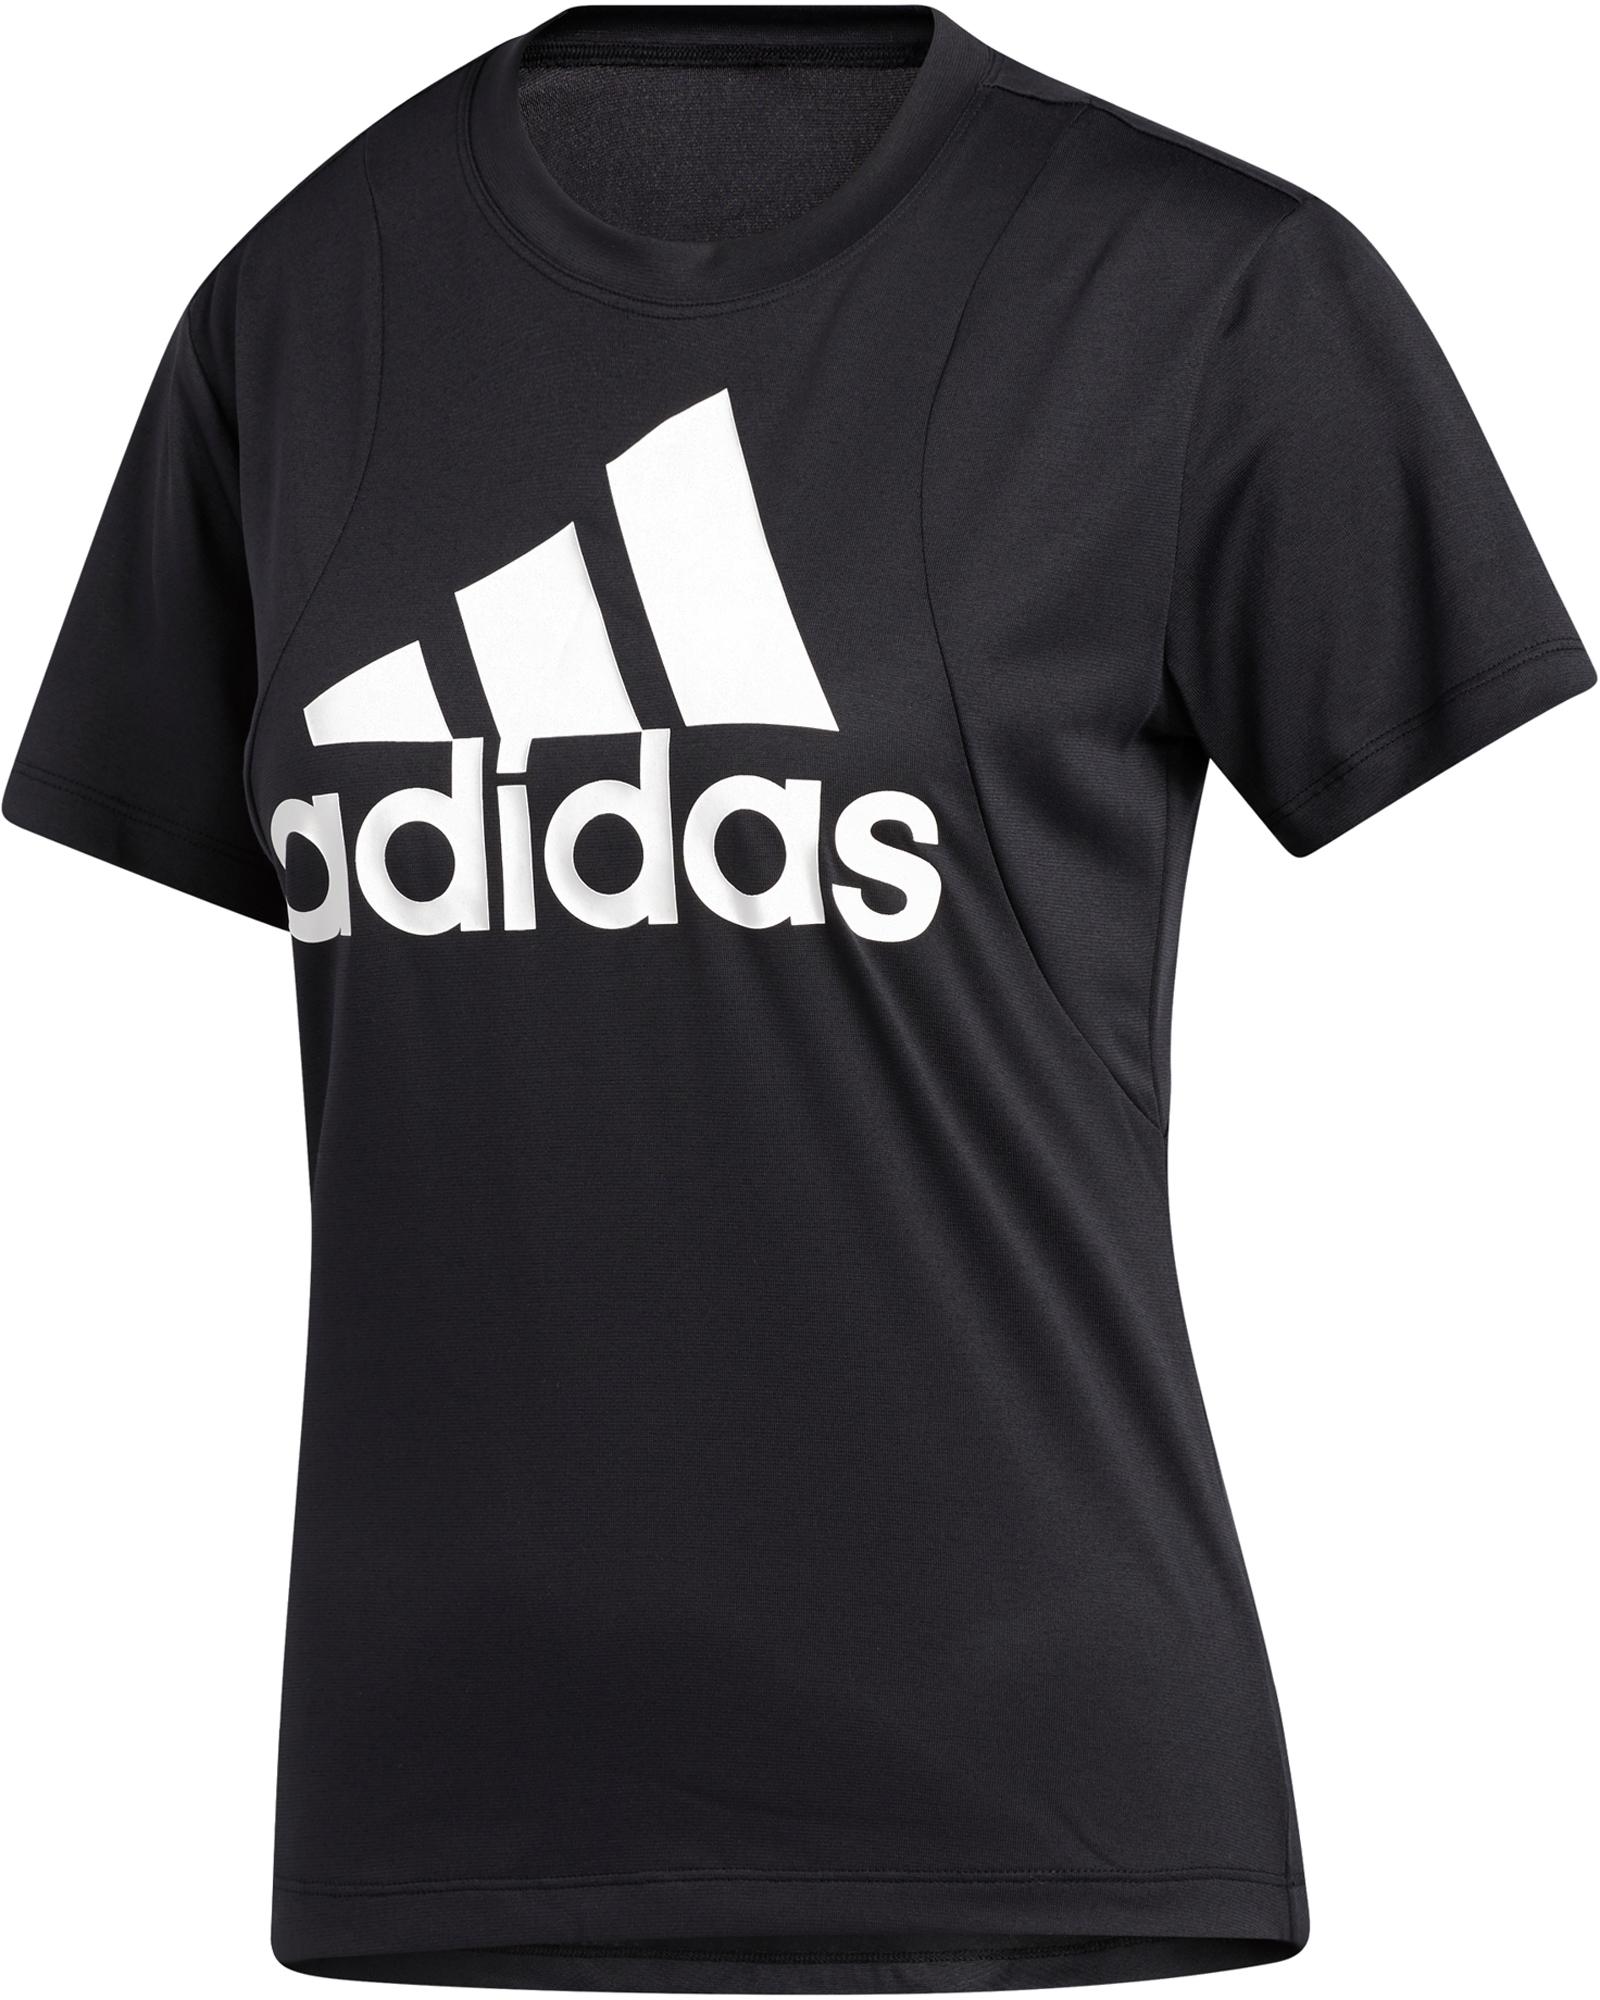 Adidas Футболка женская adidas Badge Of Sport Logo, размер 46-48